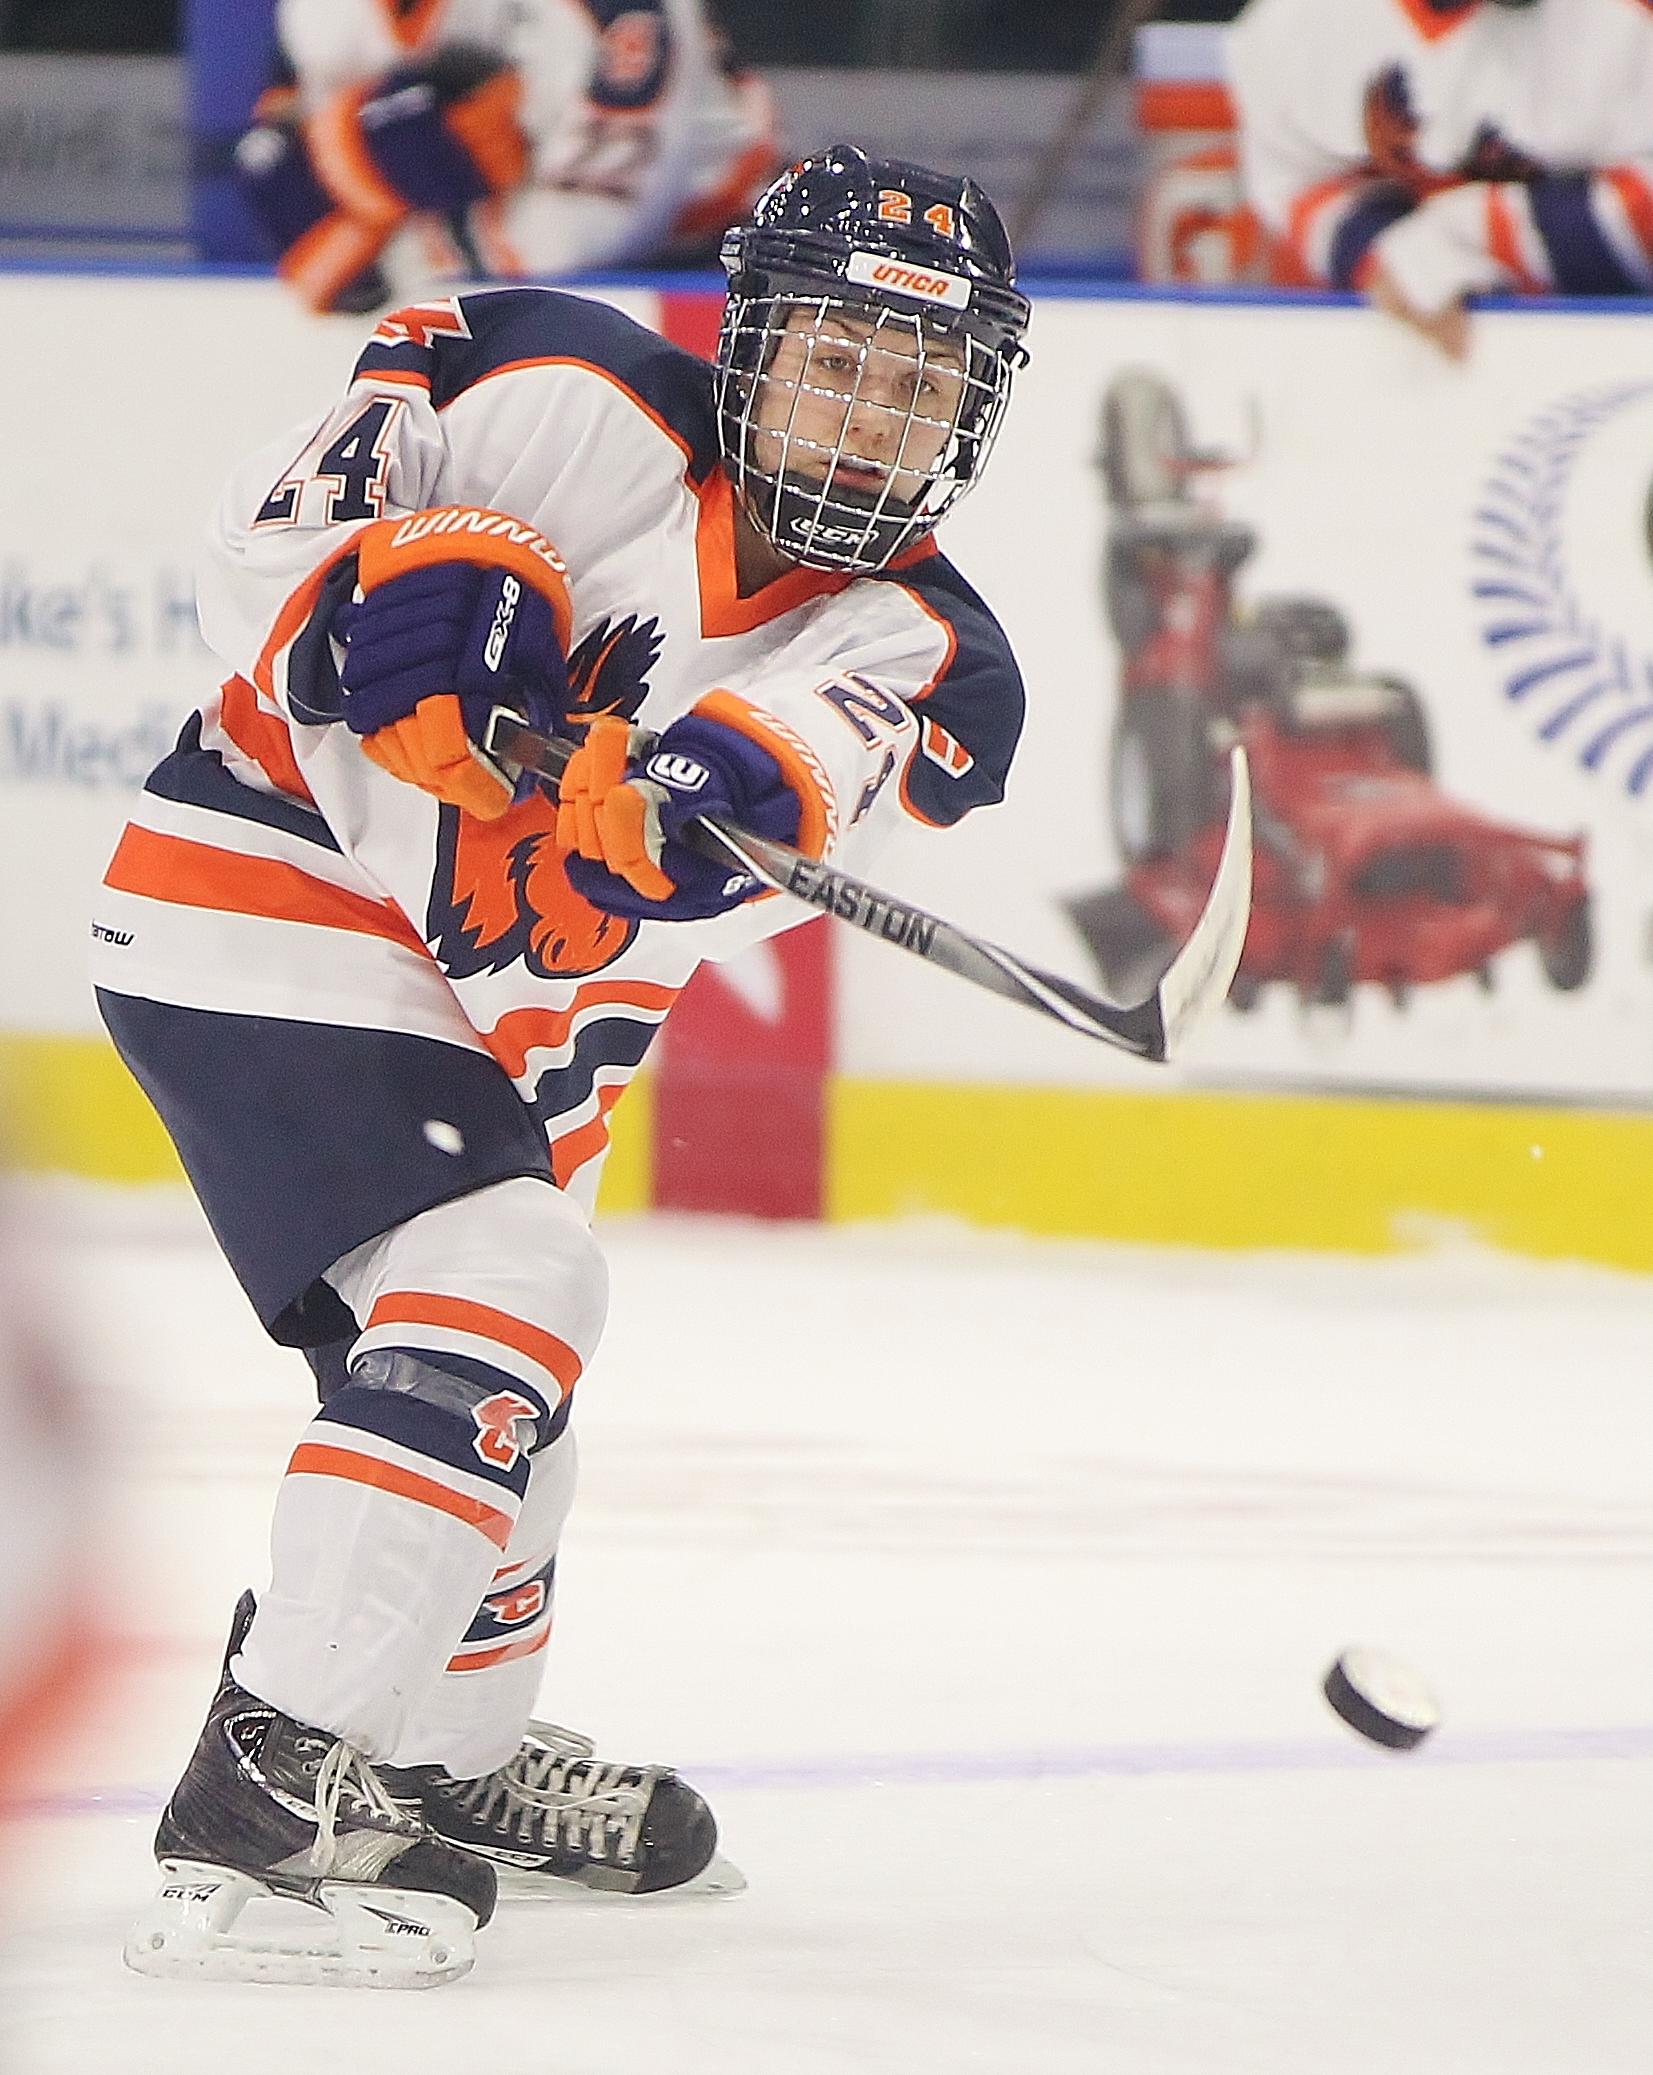 UC Women's Hockey Action